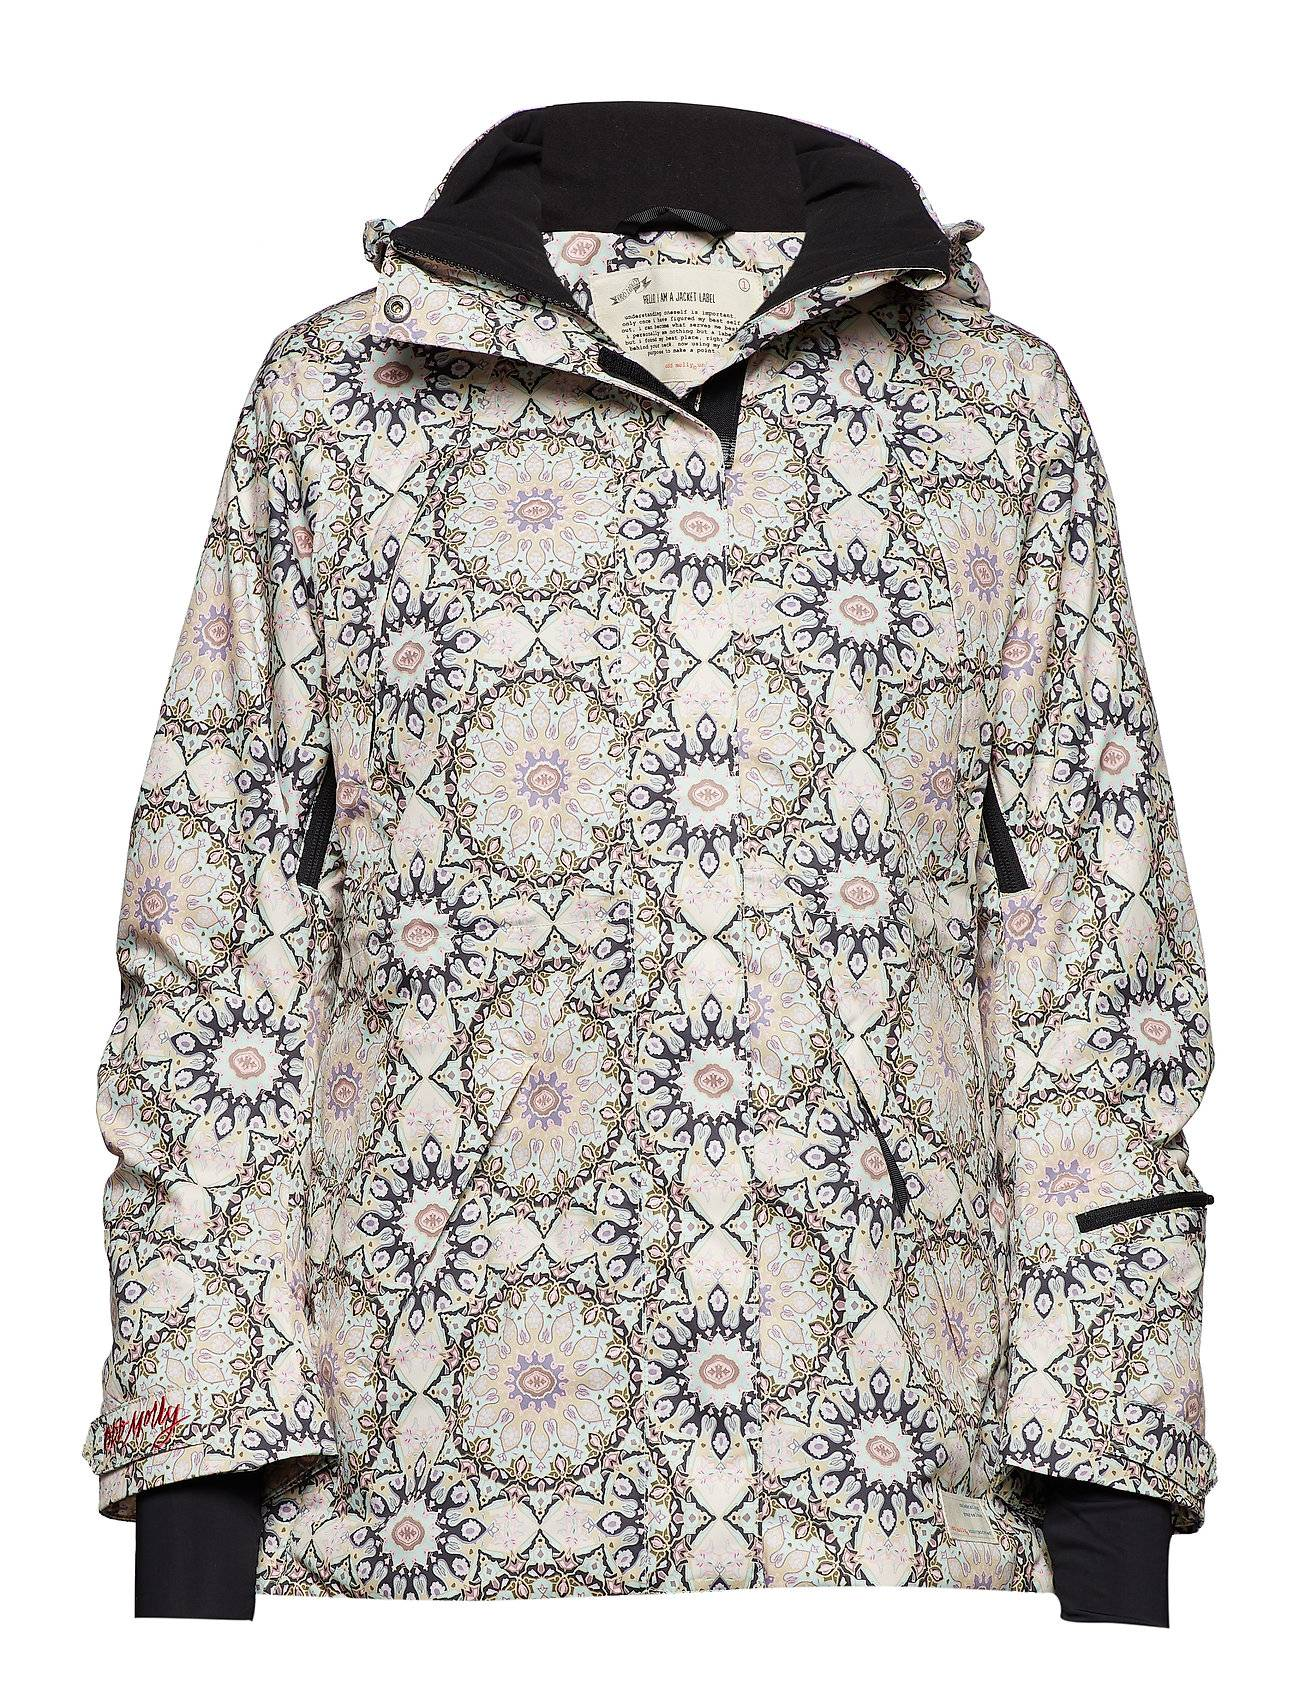 Image of ODD MOLLY ACTIVE WEAR Love-Alanche Jacket Vuorillinen Takki Topattu Takki Vaaleanpunainen ODD MOLLY ACTIVE WEAR